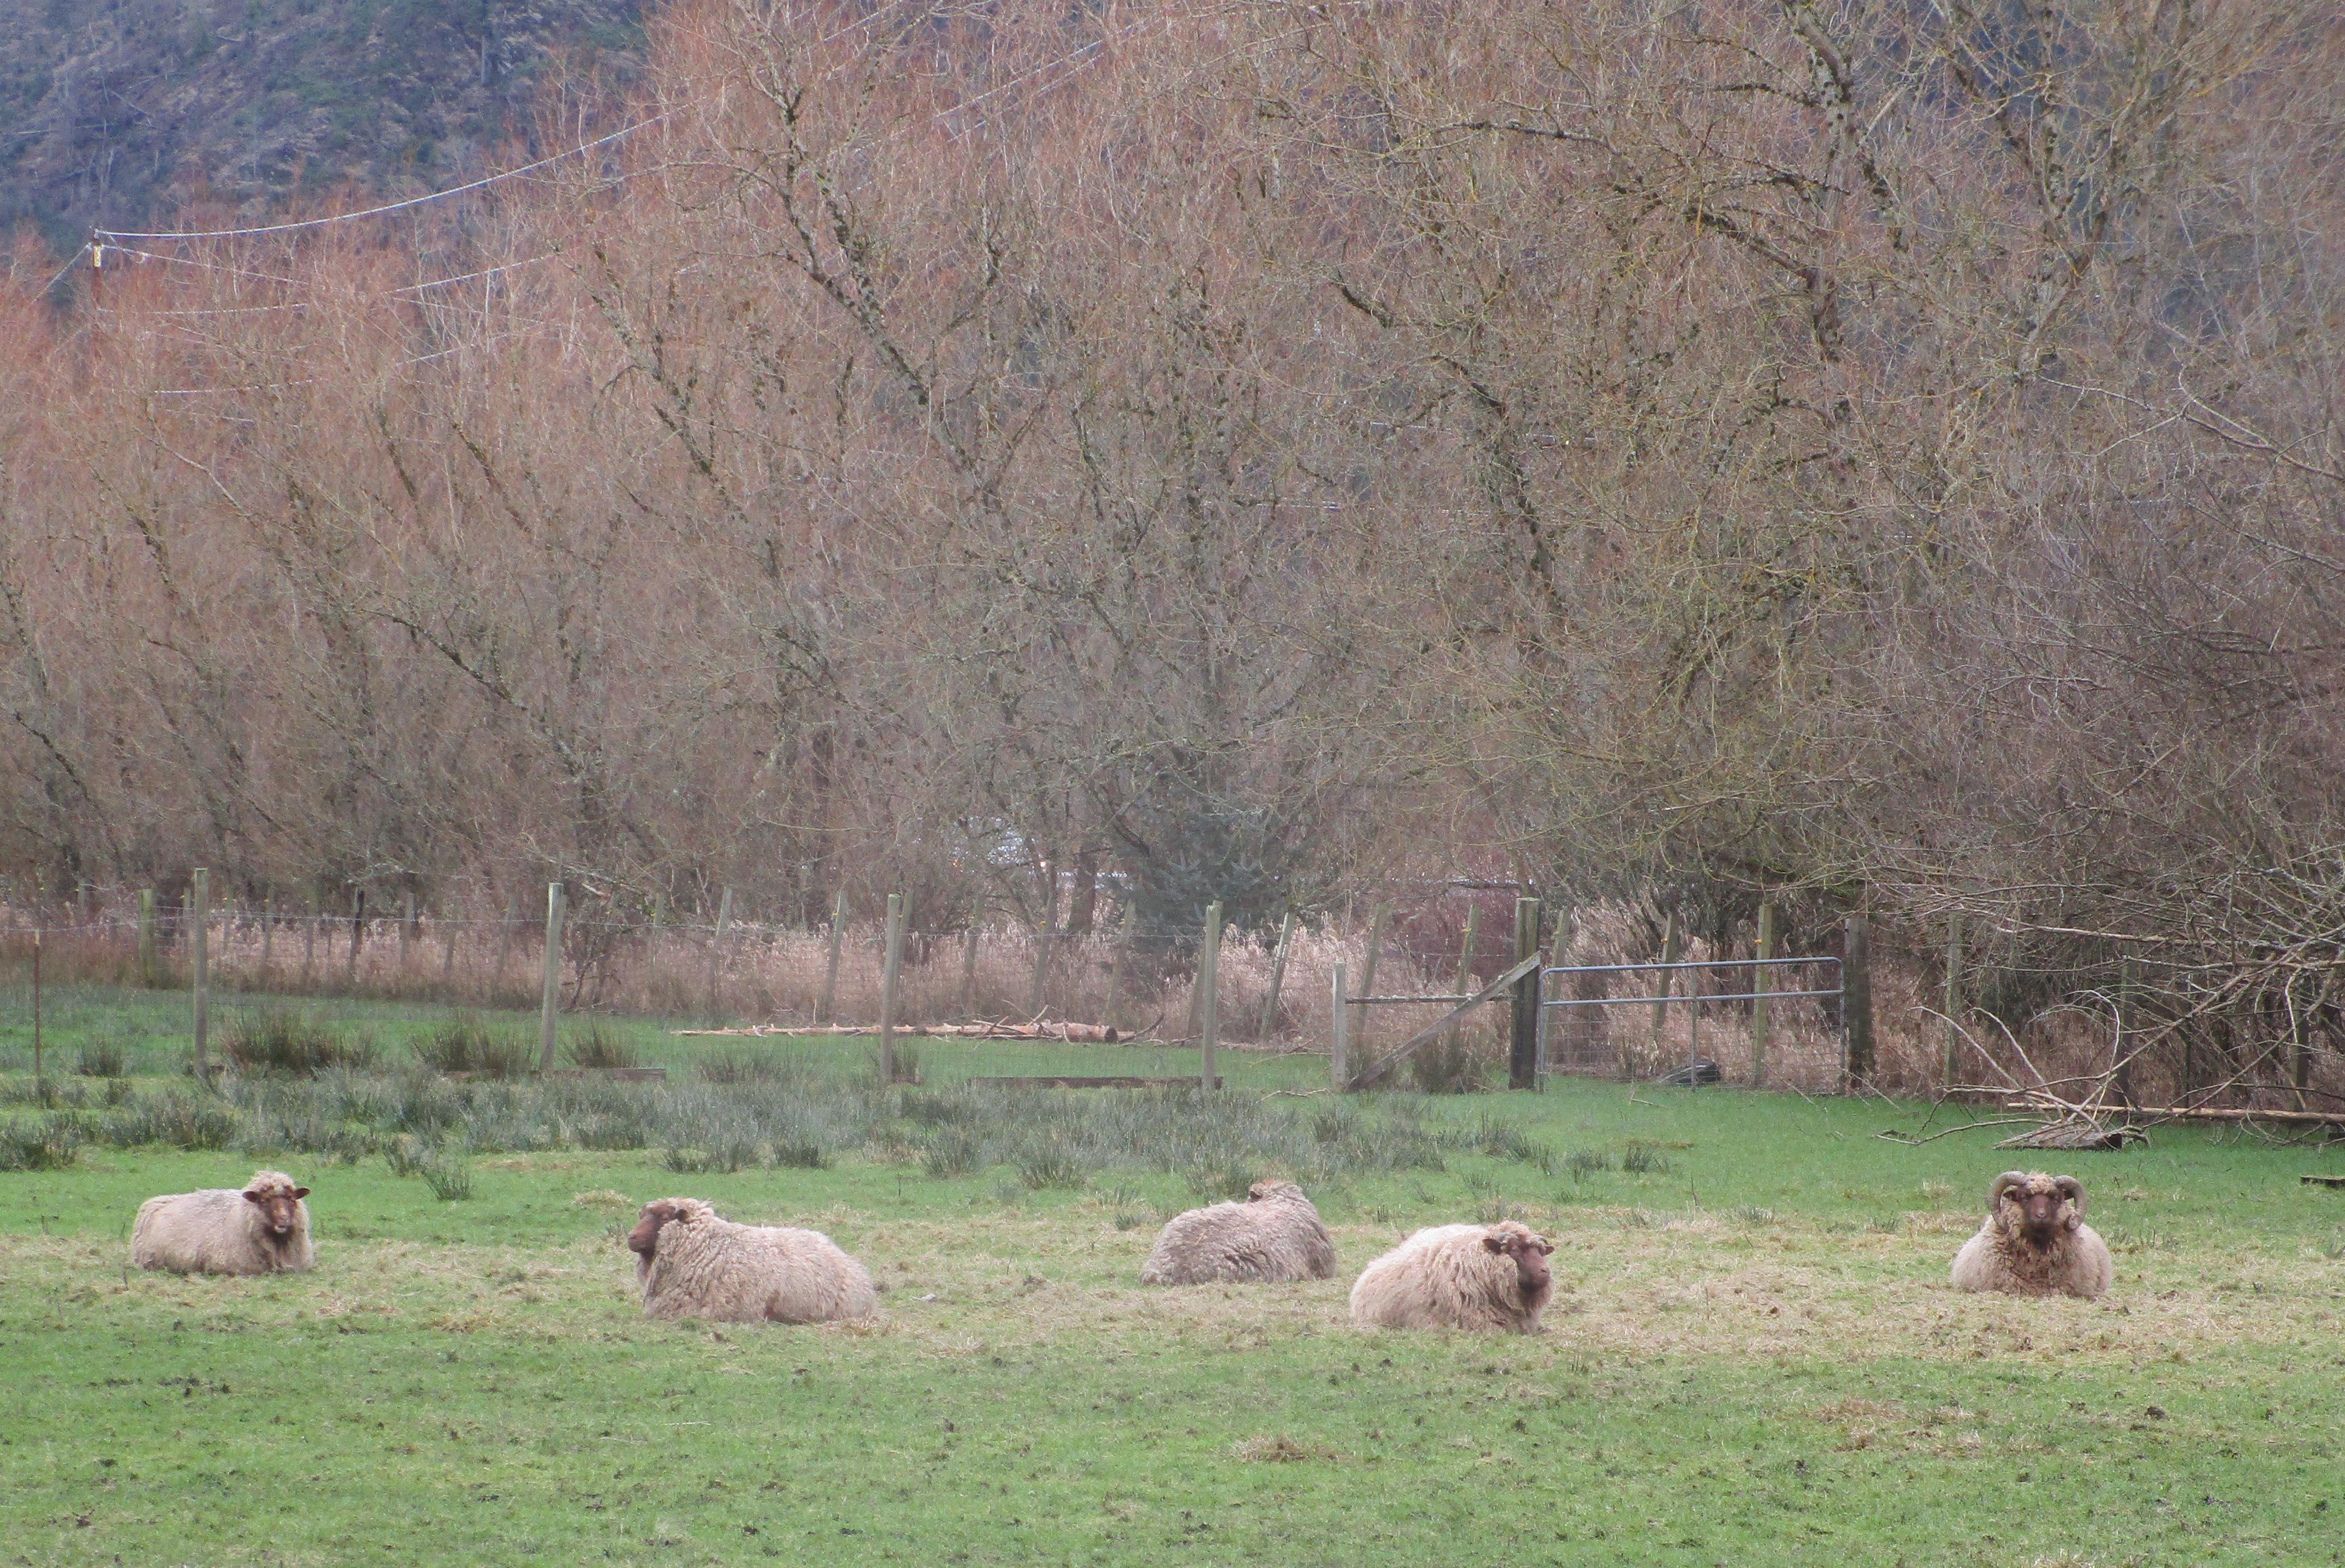 Mioget sheep